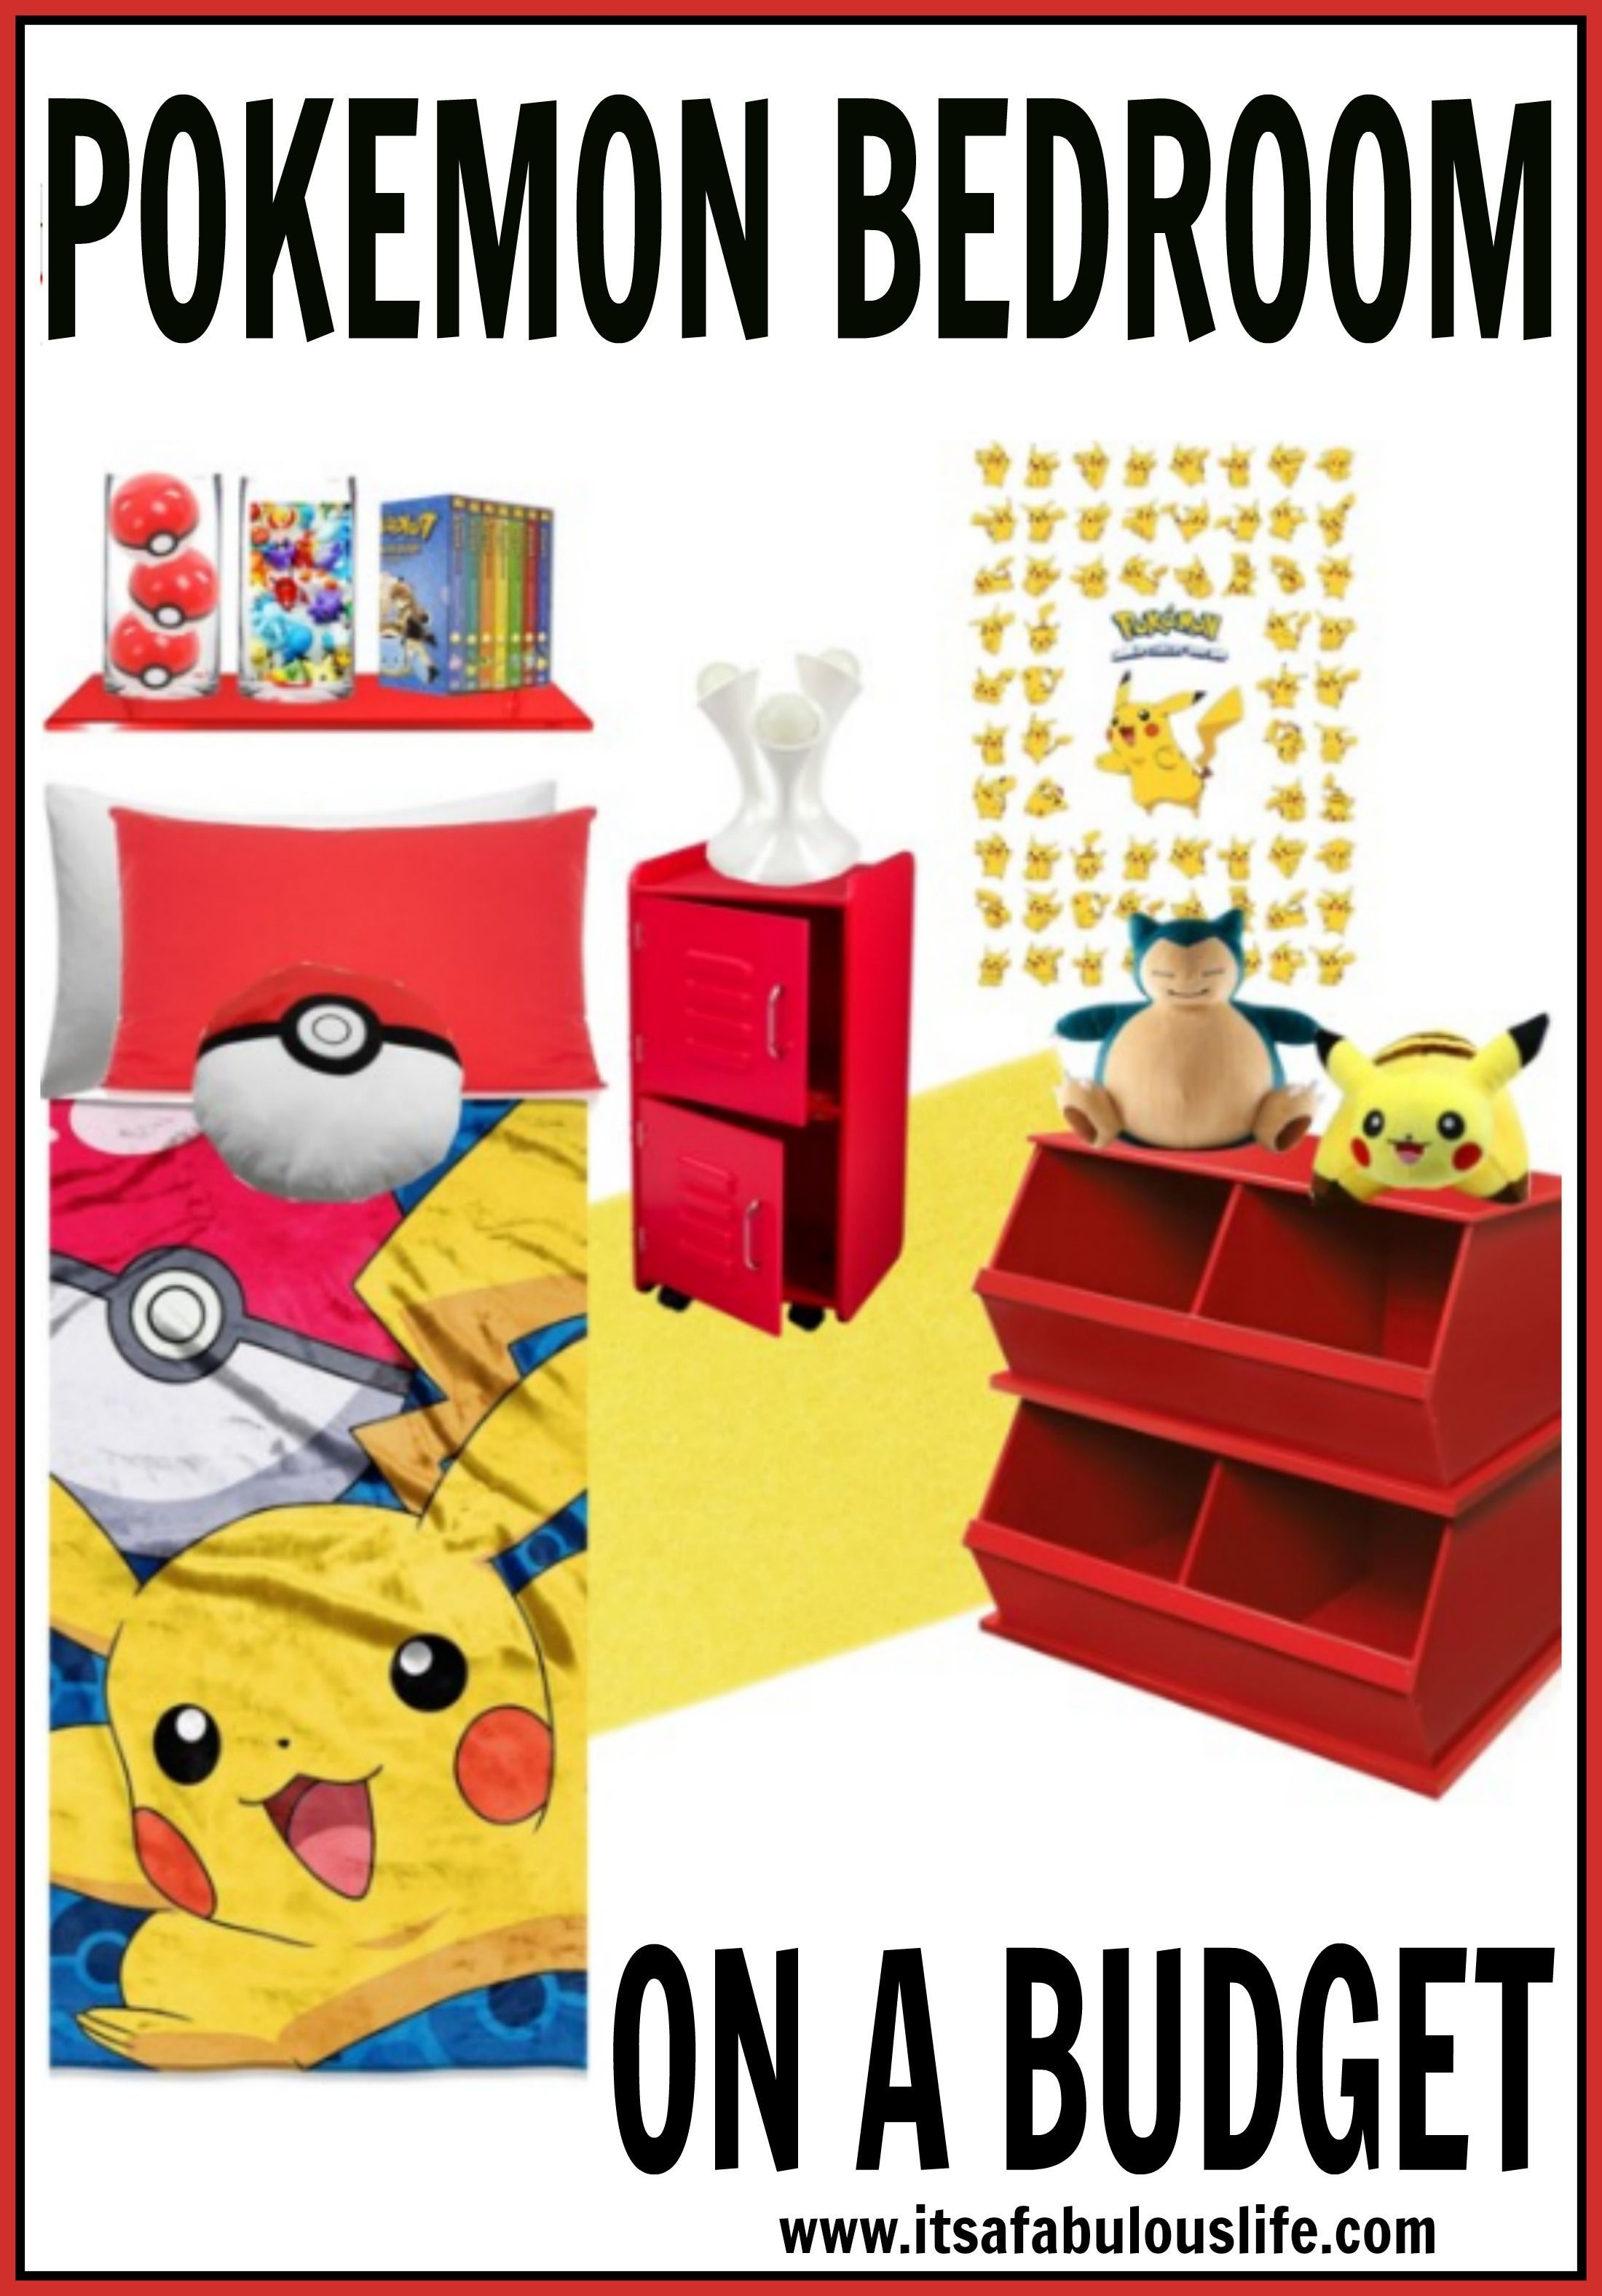 Pin on Pokemon room